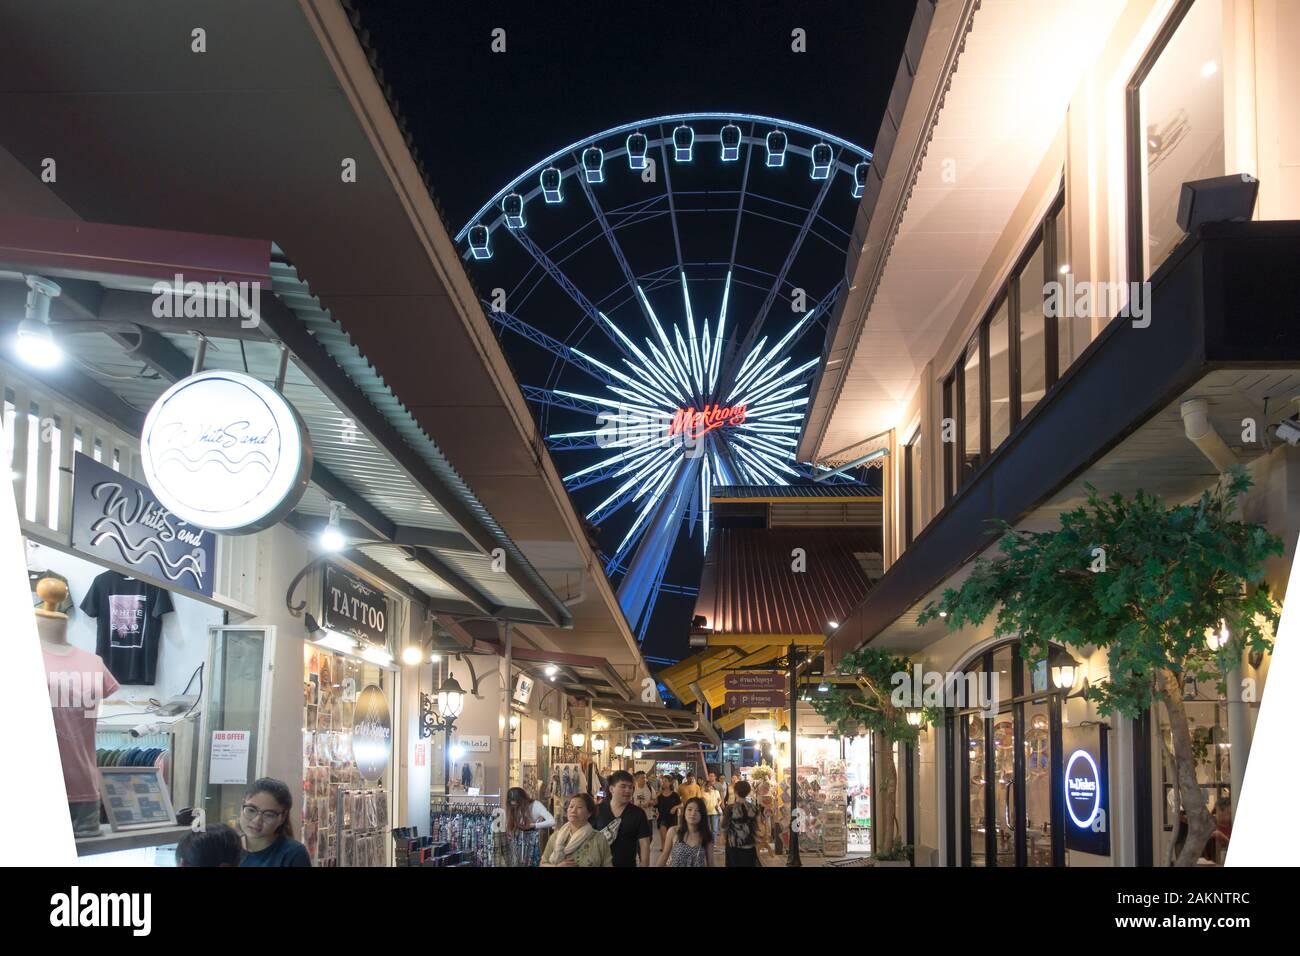 Asiatique: La costanera es un gran centro comercial al aire libre en Bangkok. Foto de stock